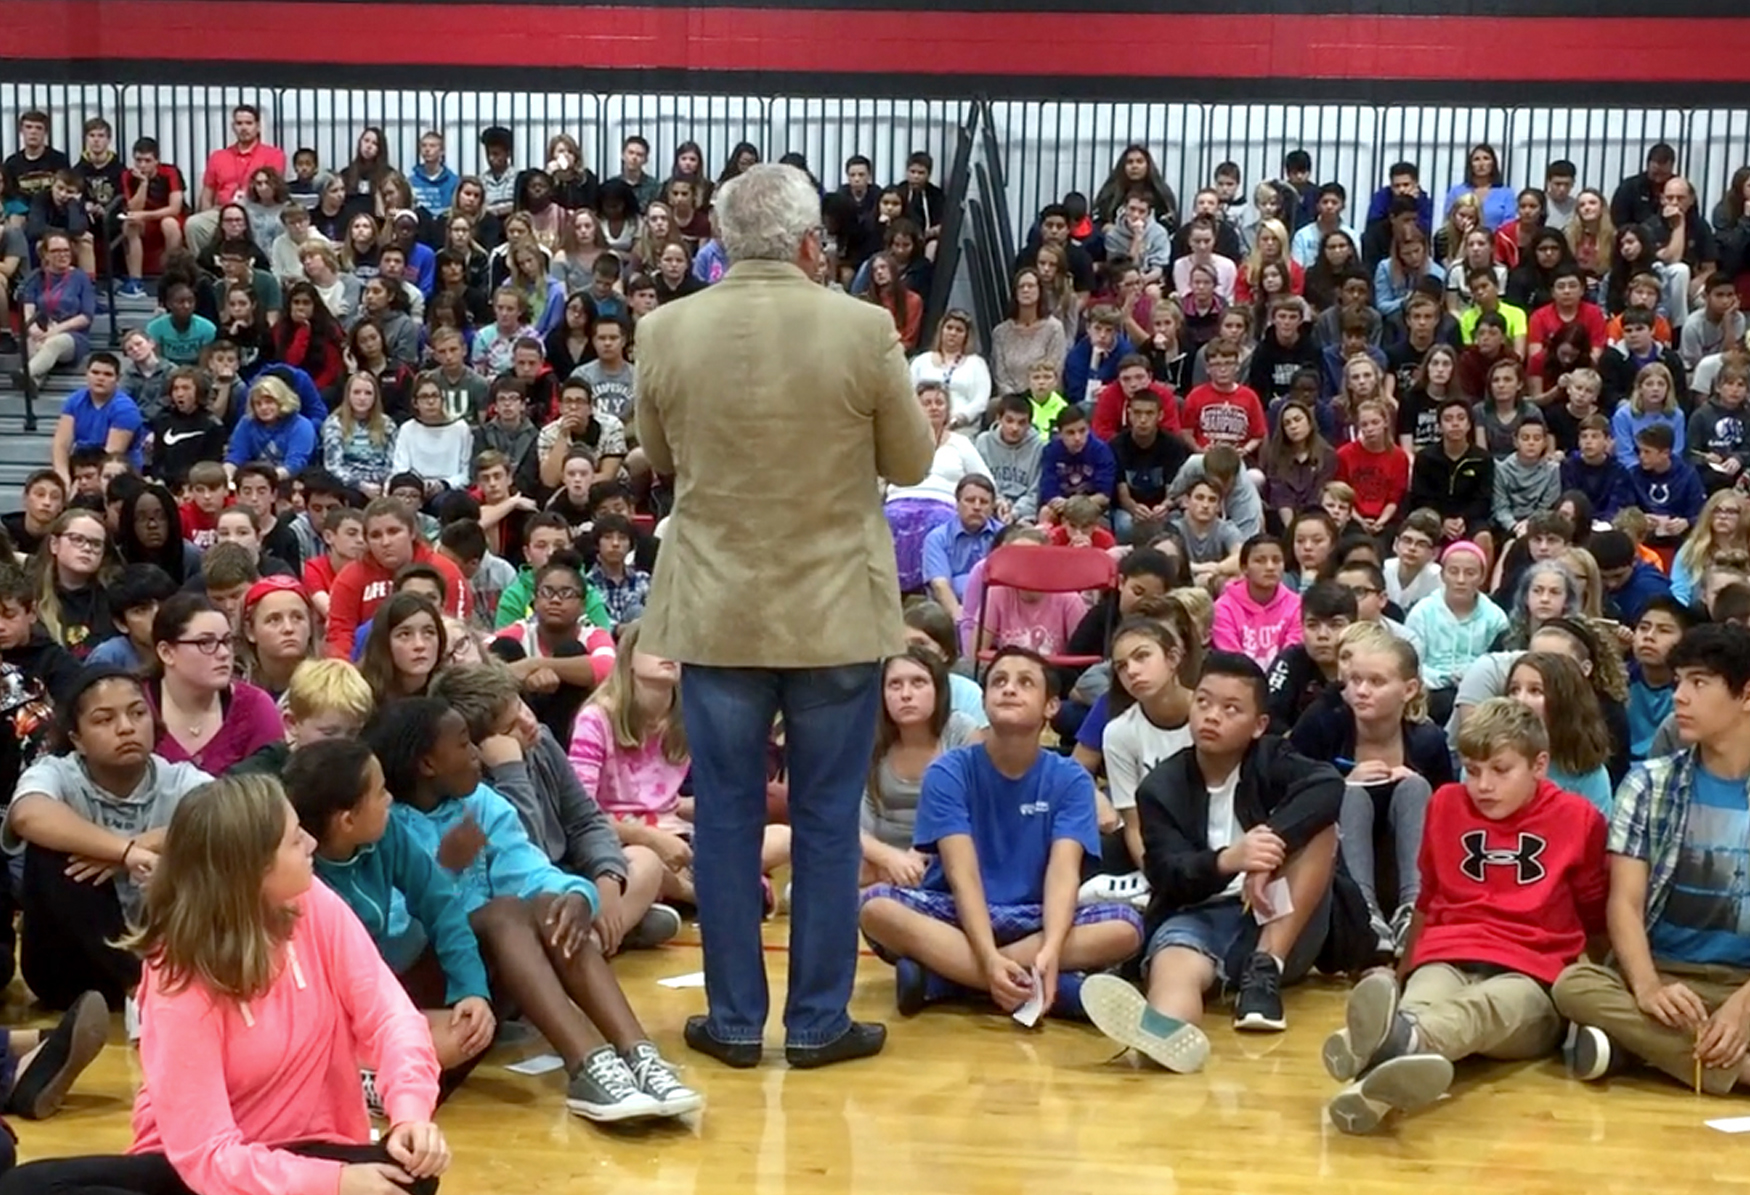 Student Impact Speeches - An inspiring message teaching a Five Step Process for Self-Empowerment